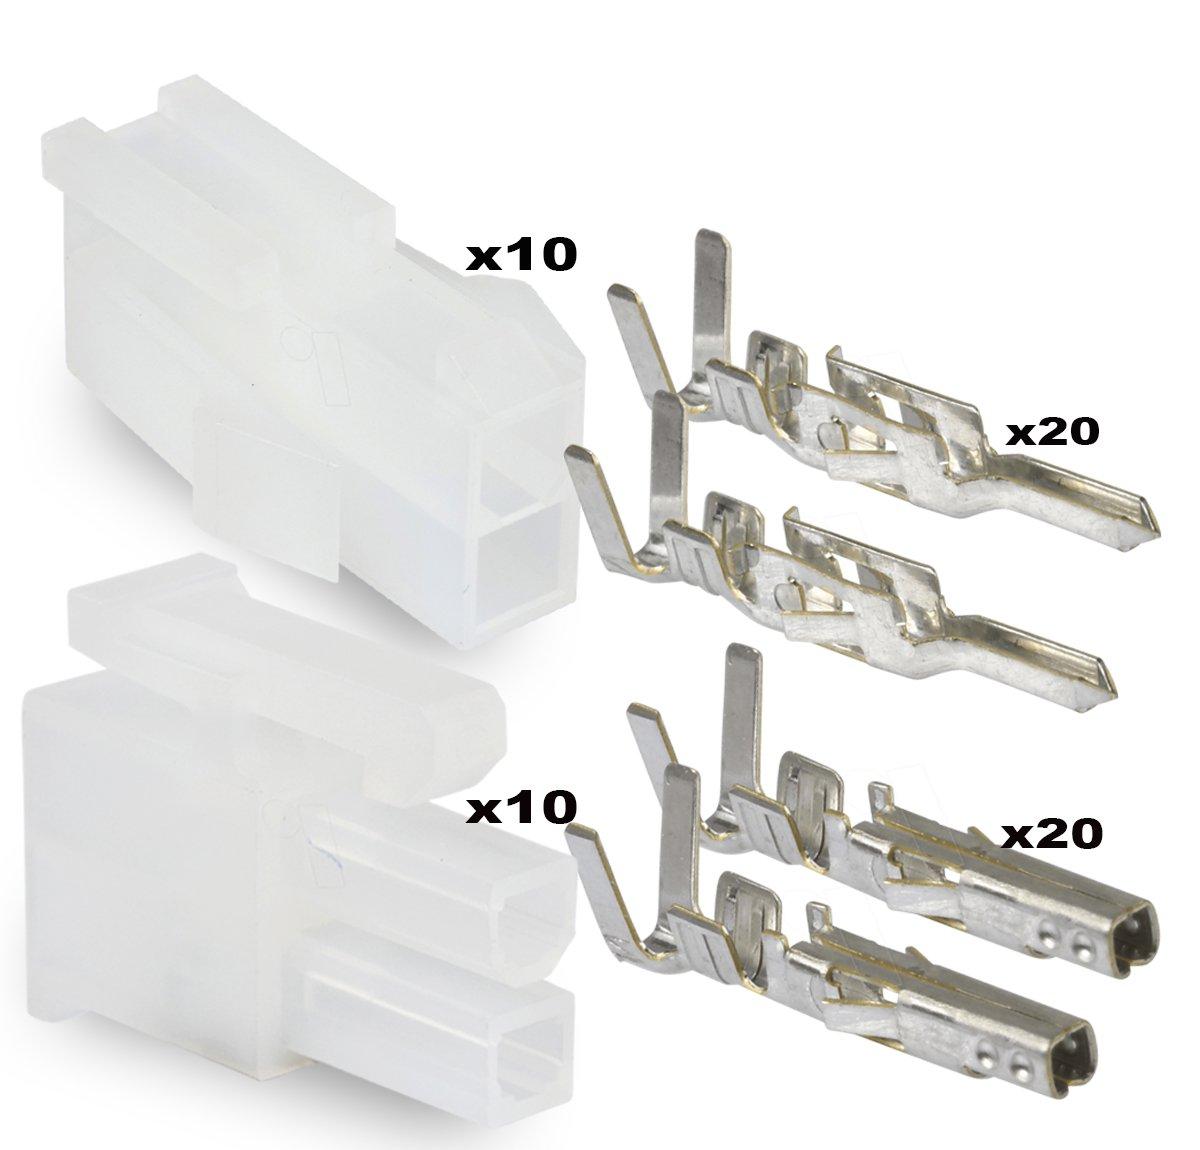 4x Molex Connector Mini Fit JR male female door 2x2 4 piece poles